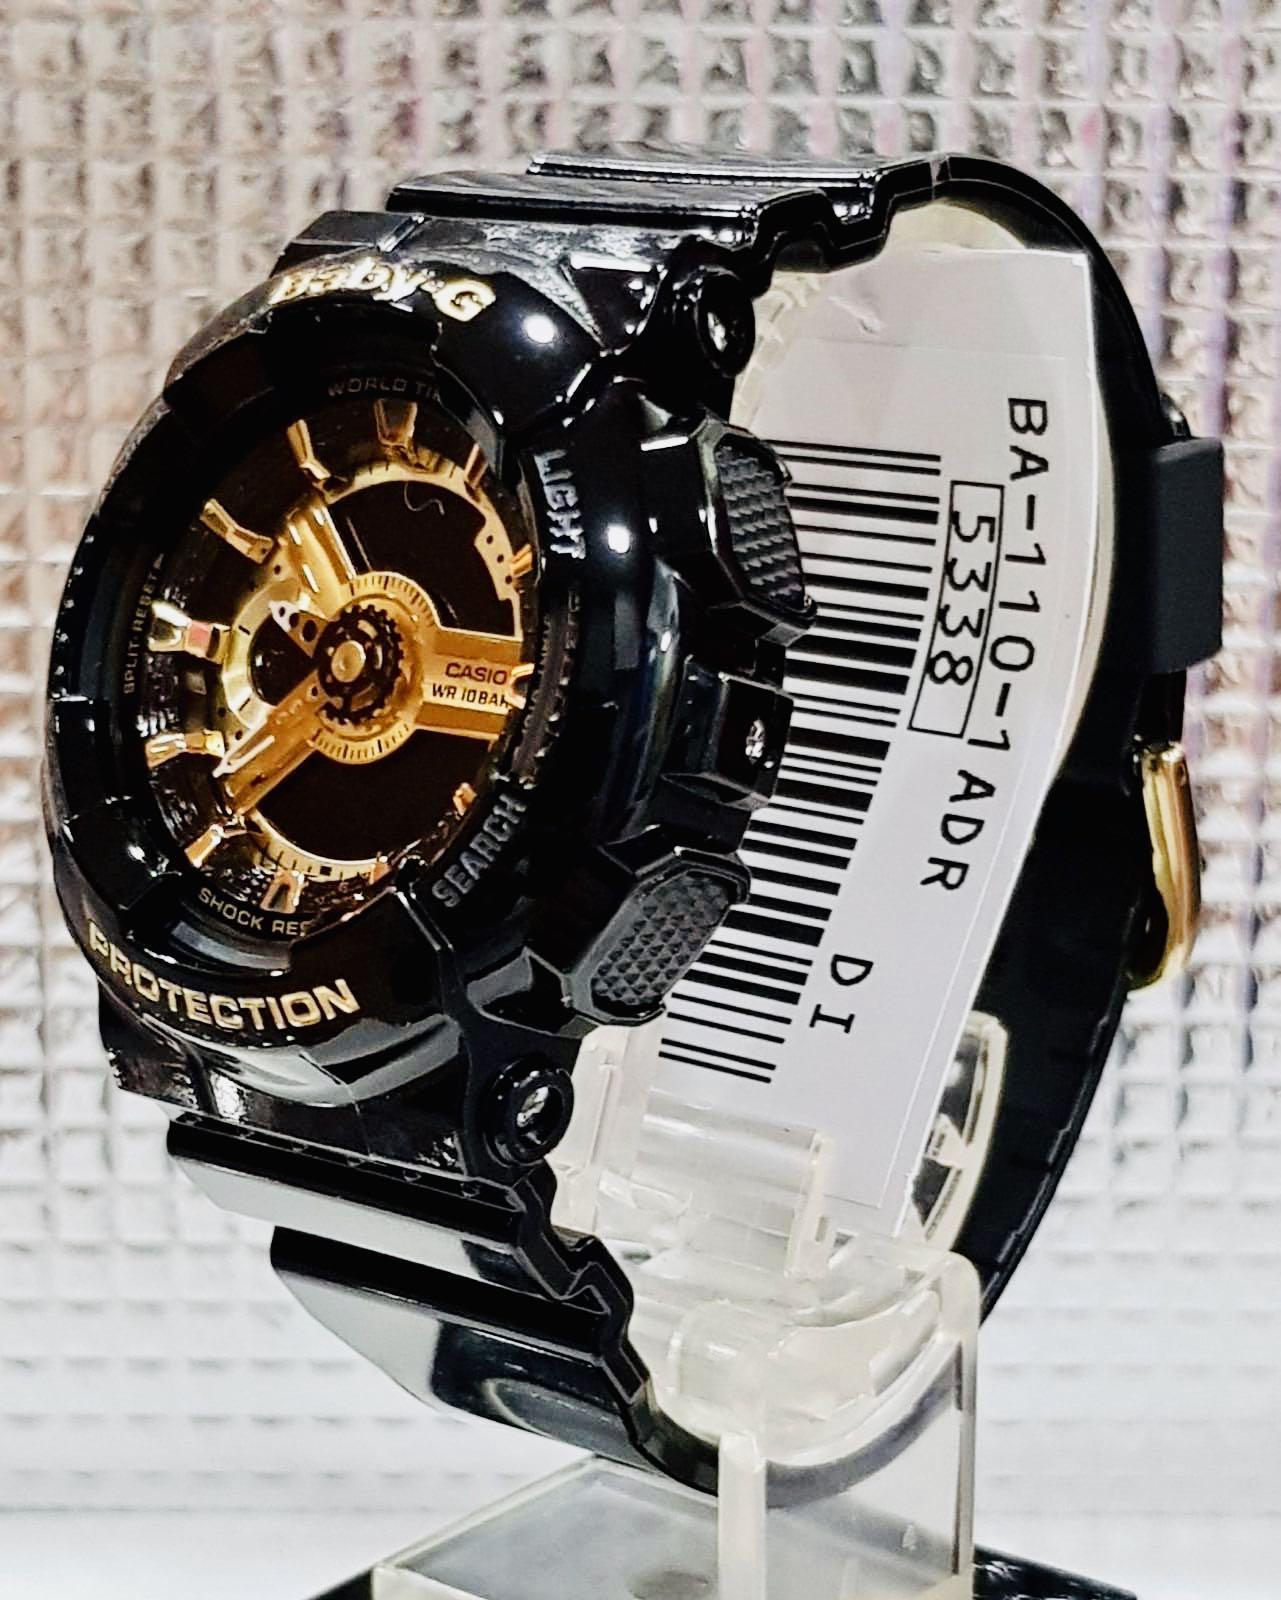 NEW🌟BABYG UNISEX SPORTS WATCH : 100% ORIGINAL AUTHENTIC ( GSHOCK  ) CASIO BABY-G-SHOCK : BA-110-1A / BA110-1A (GLOSSY BLACK-GOLD)